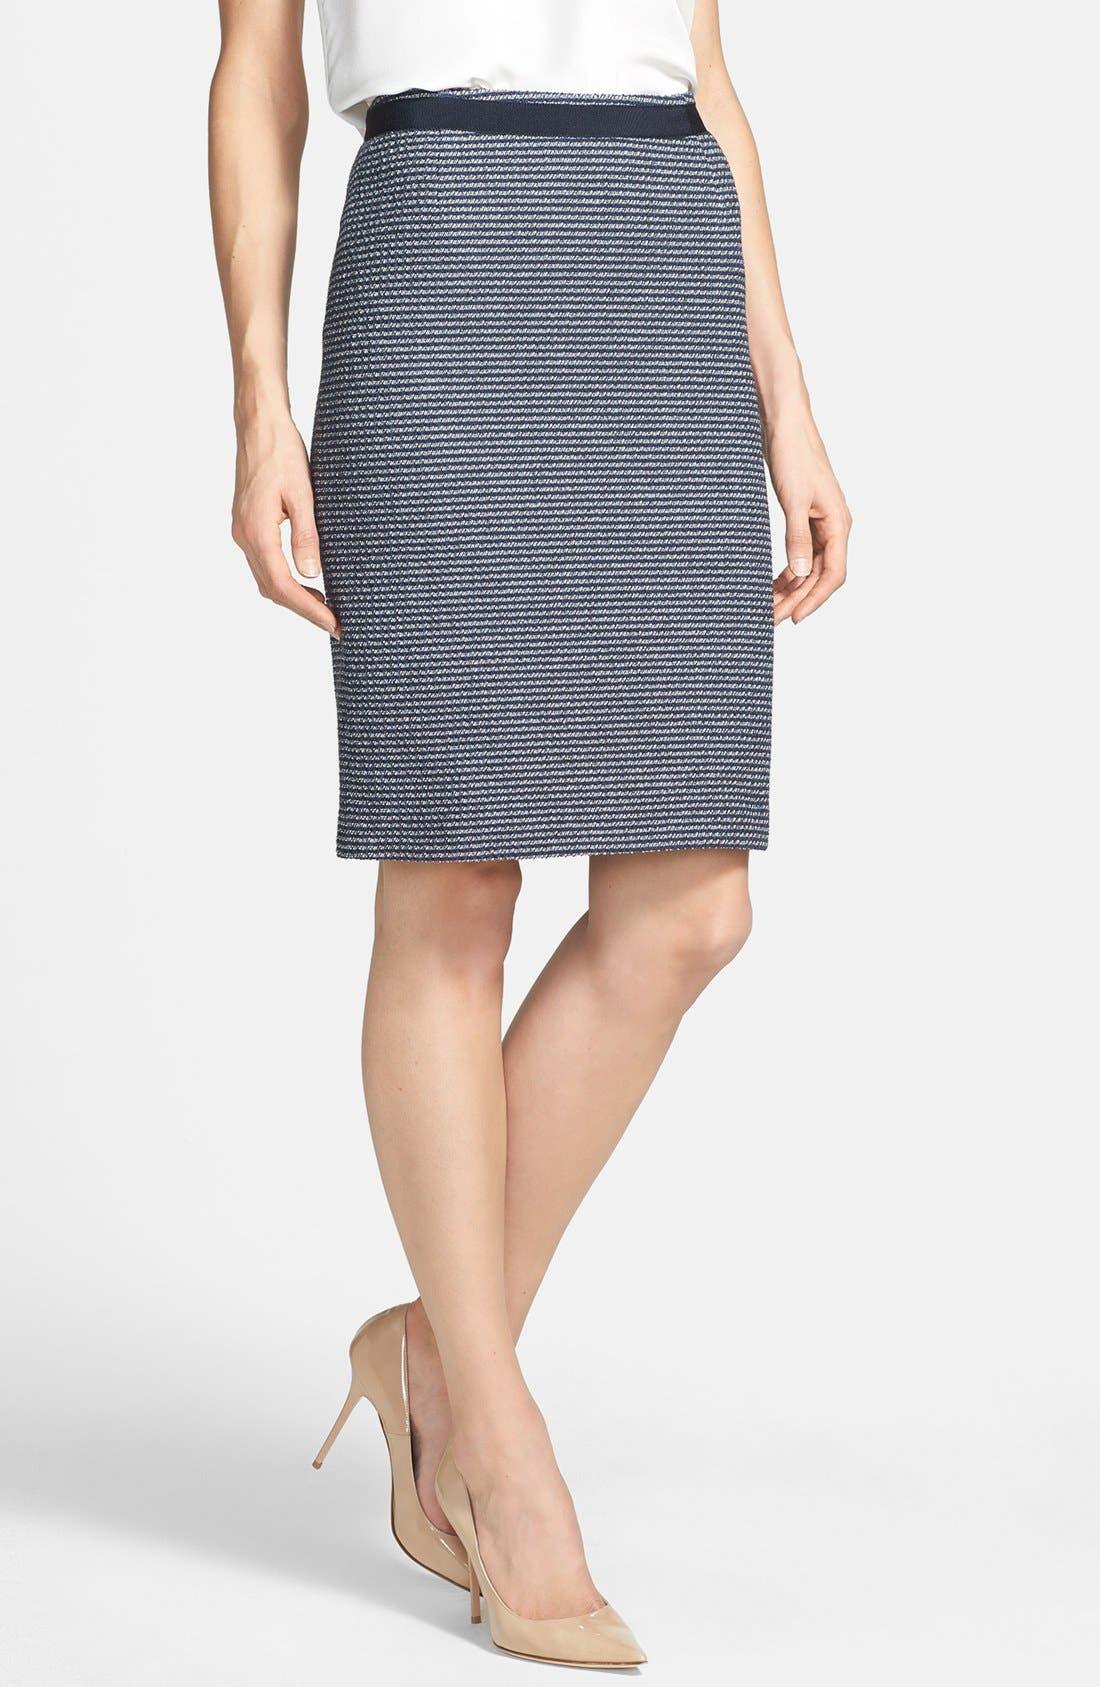 Alternate Image 1 Selected - Weekend Max Mara 'Acqua' Yarn Dyed Skirt